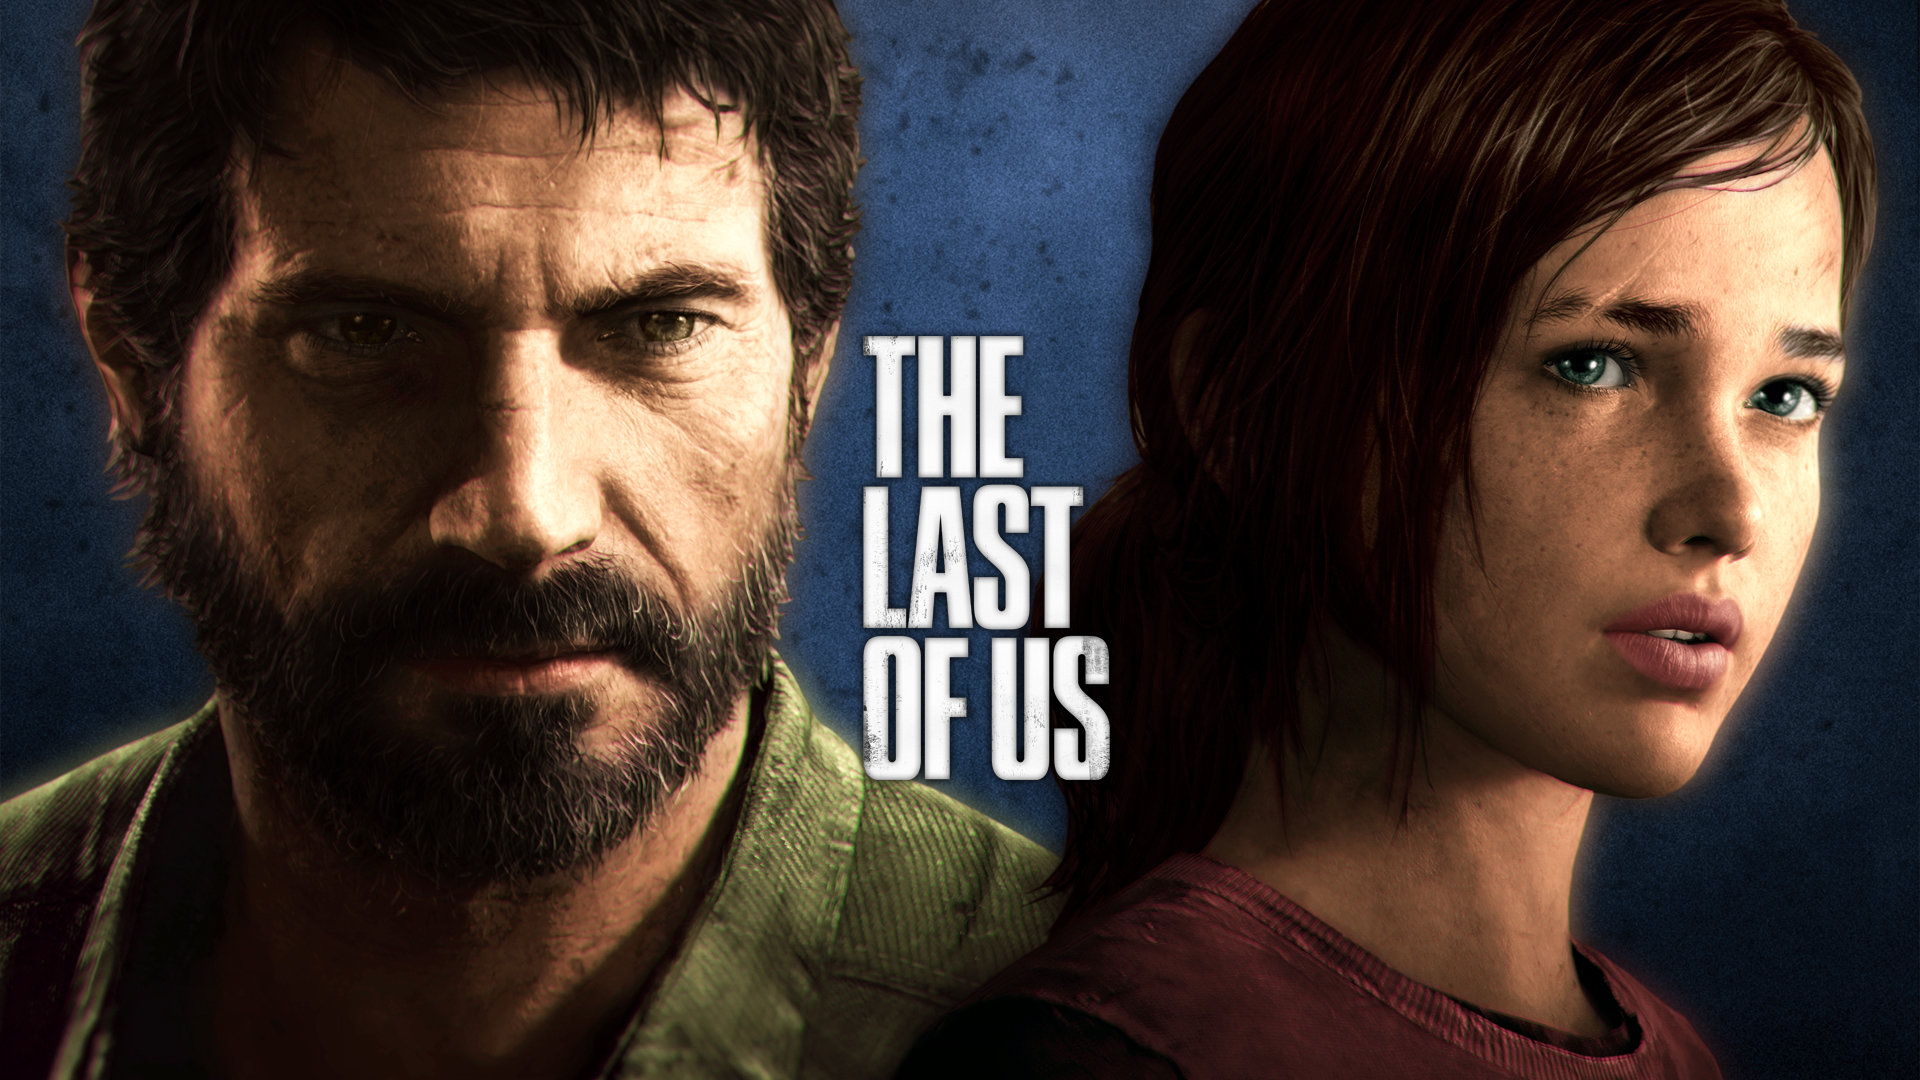 The Last Of Us Wallpapers 1920x1080 Full Hd 1080p Desktop